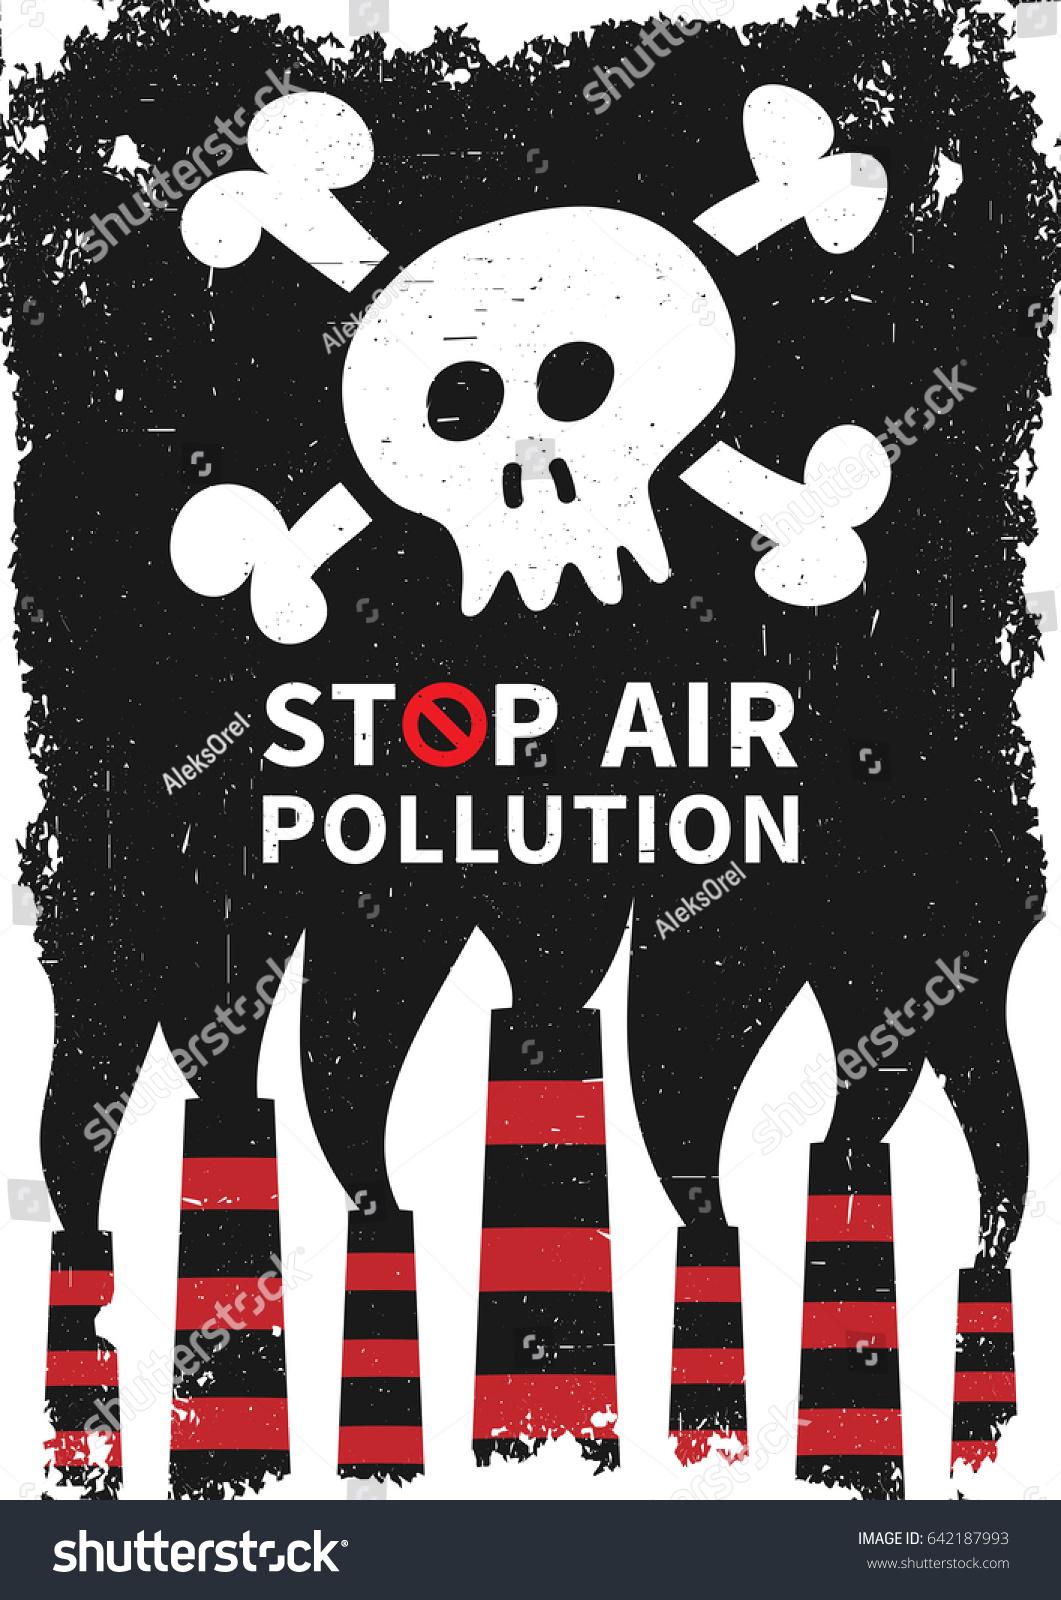 Air Pollution Skull : Stop air pollution skull vector illustration เวกเตอร์สต็อก